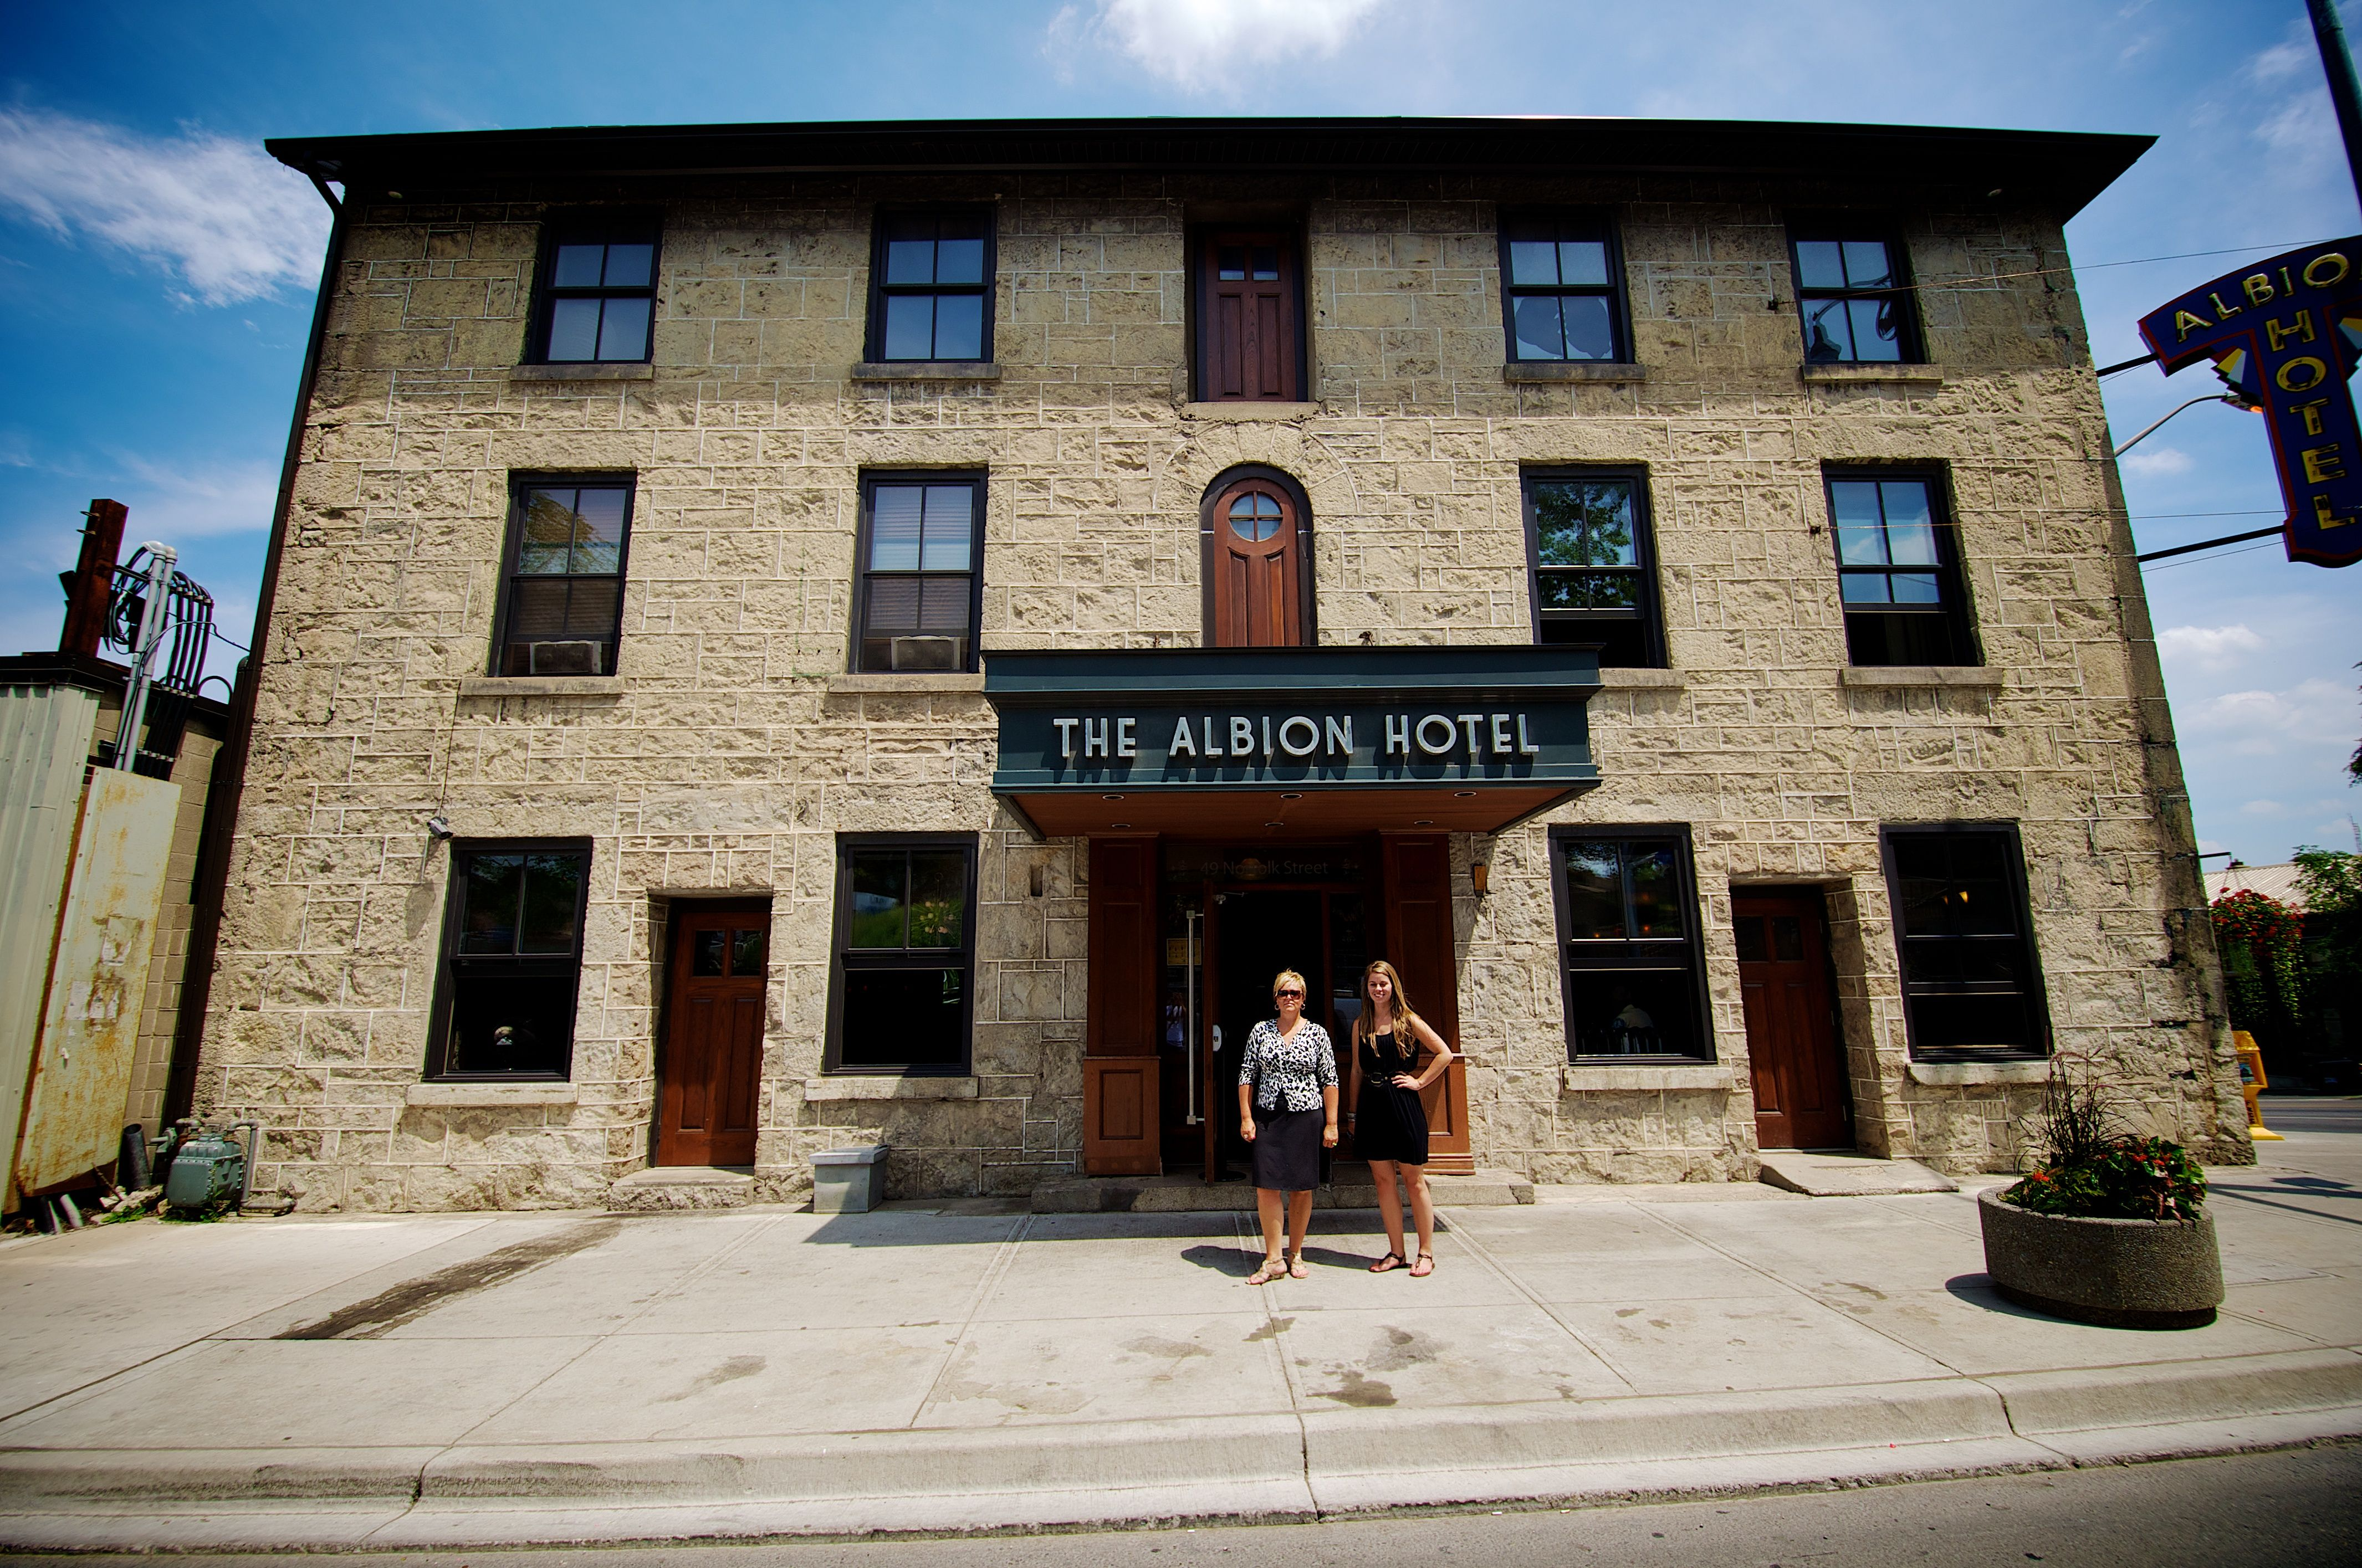 The Albion Hotel RestaurantPub Downtown GuelphOntario Food - Guelphs 12 best restaurant gems